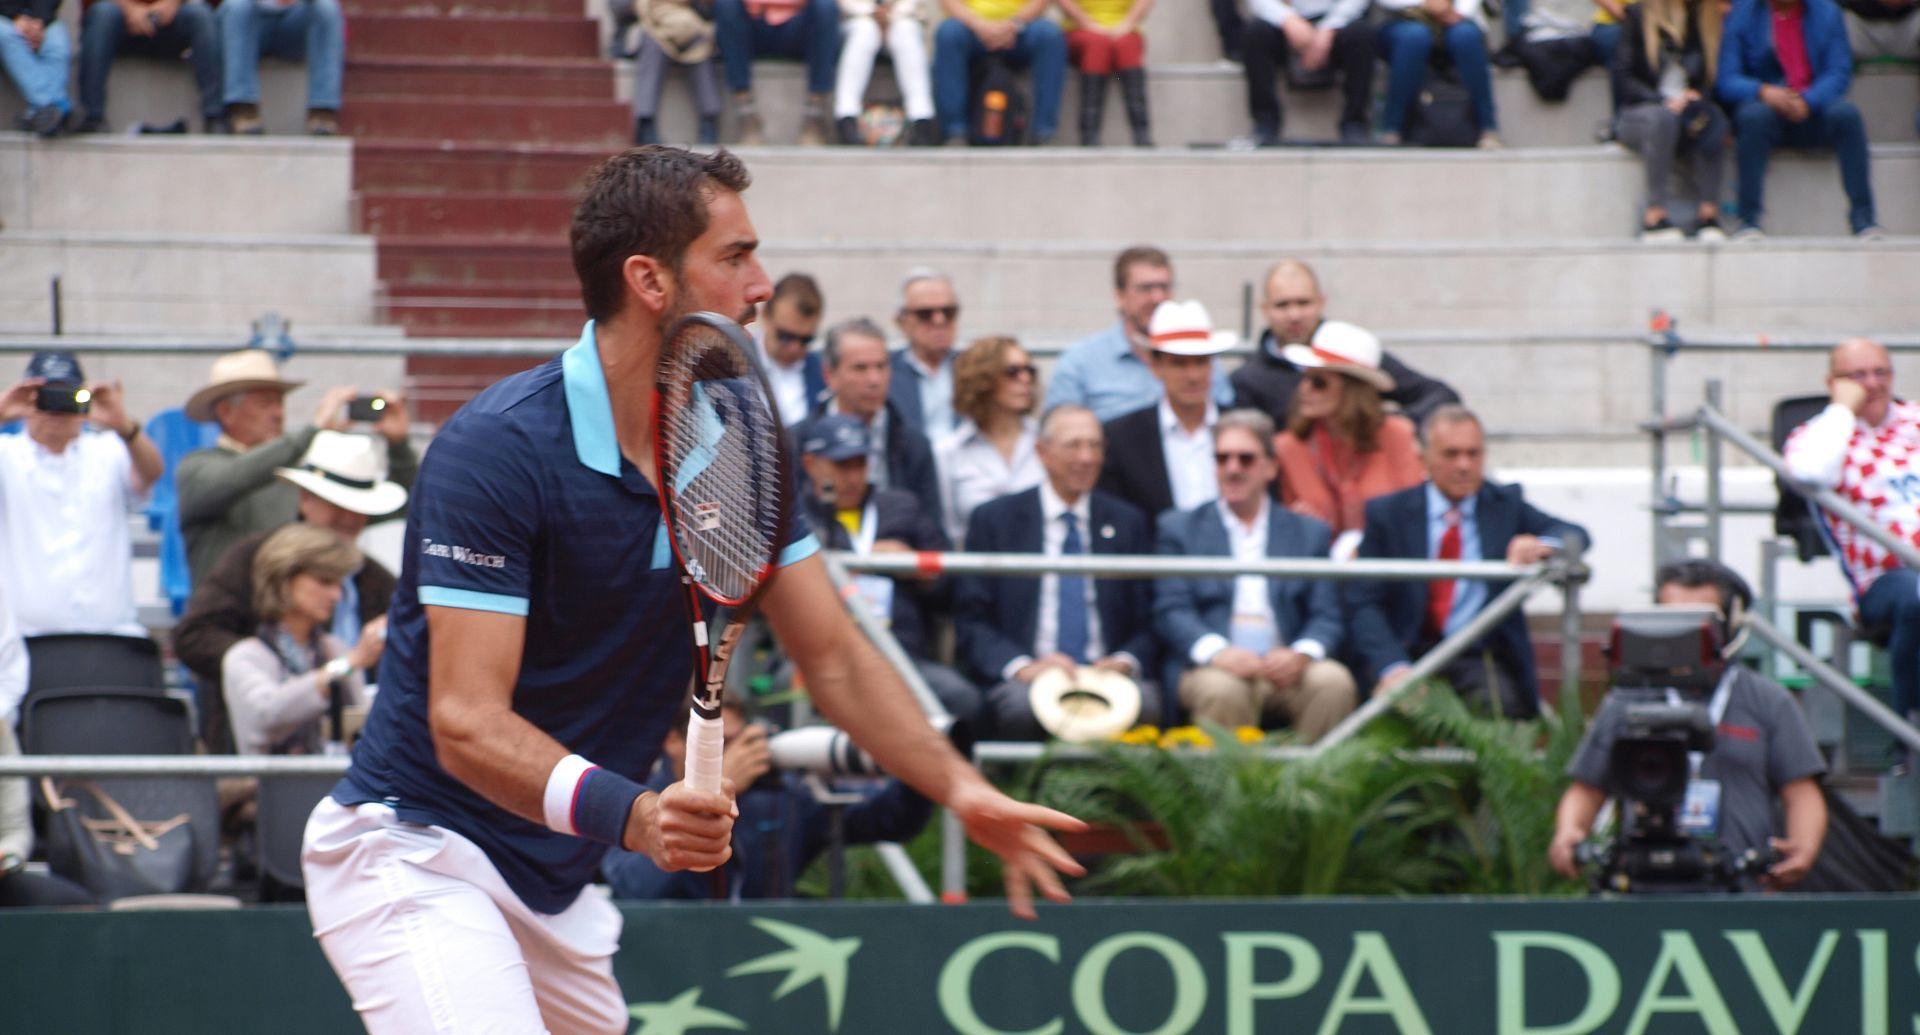 NAPETO U BOGOTI Davis Cup: Kolumbija – Hrvatska 1-1